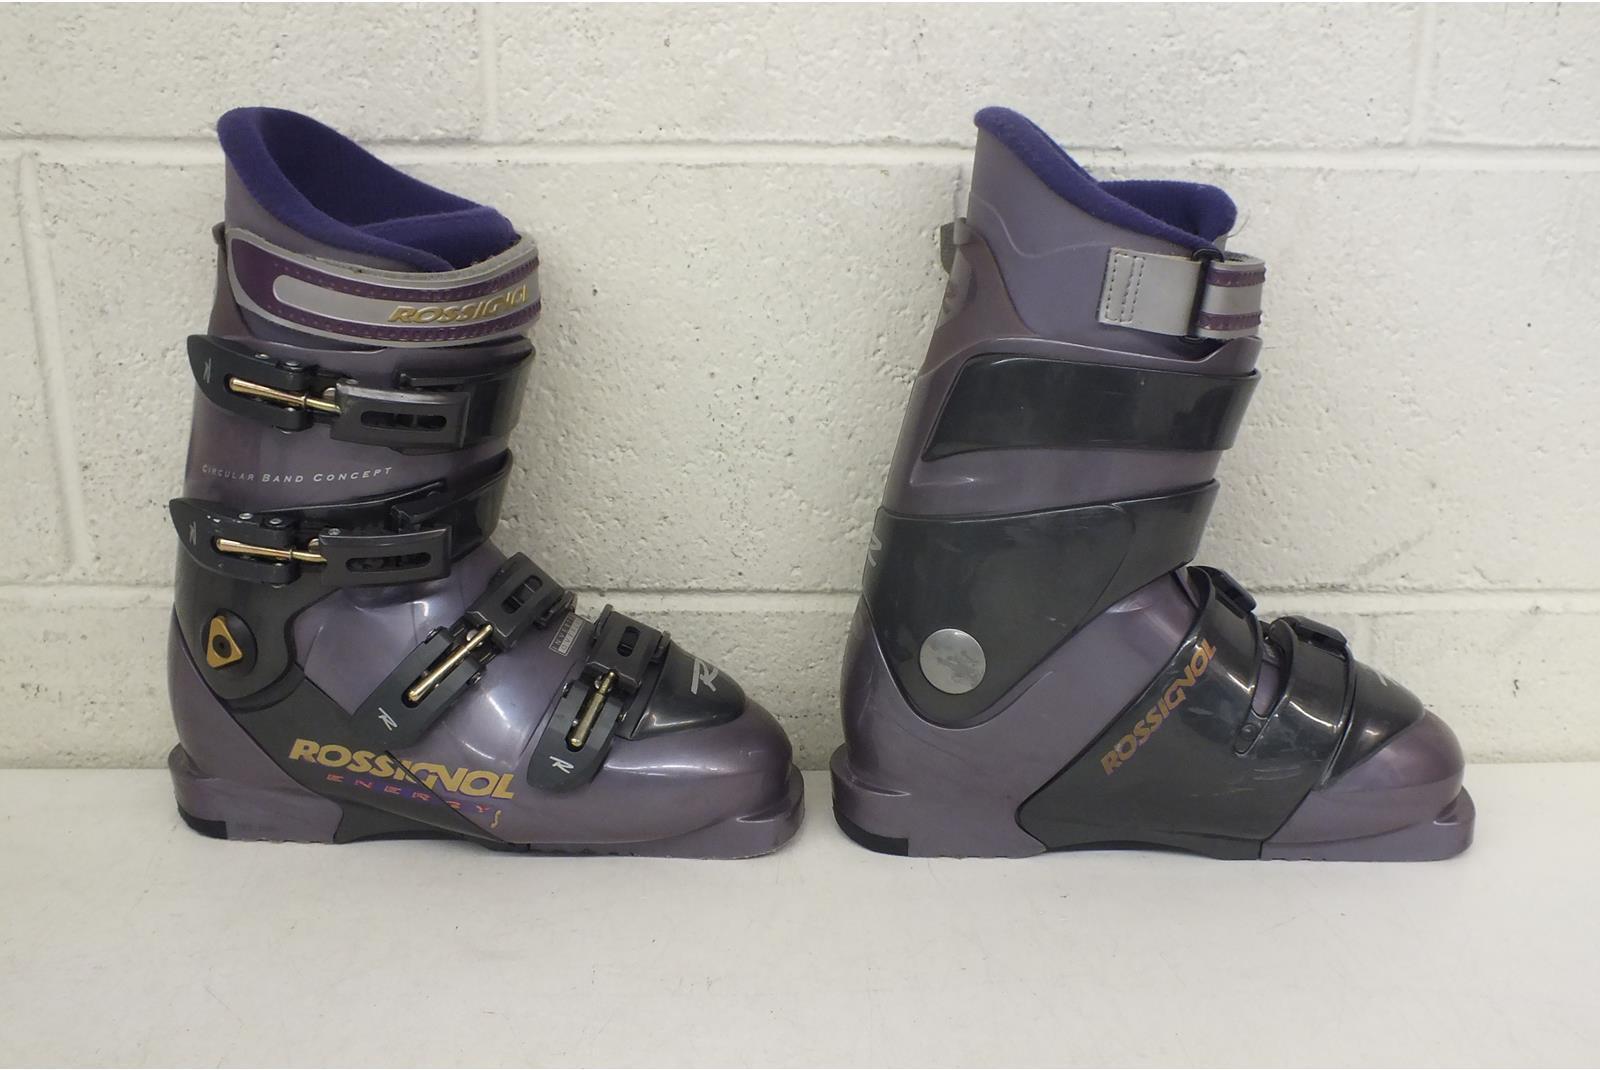 Rossignol Energy S Inverted Overlap Downhill Ski Ski Ski Stivali MDP 24.5 US Donna 7.5 c549d9